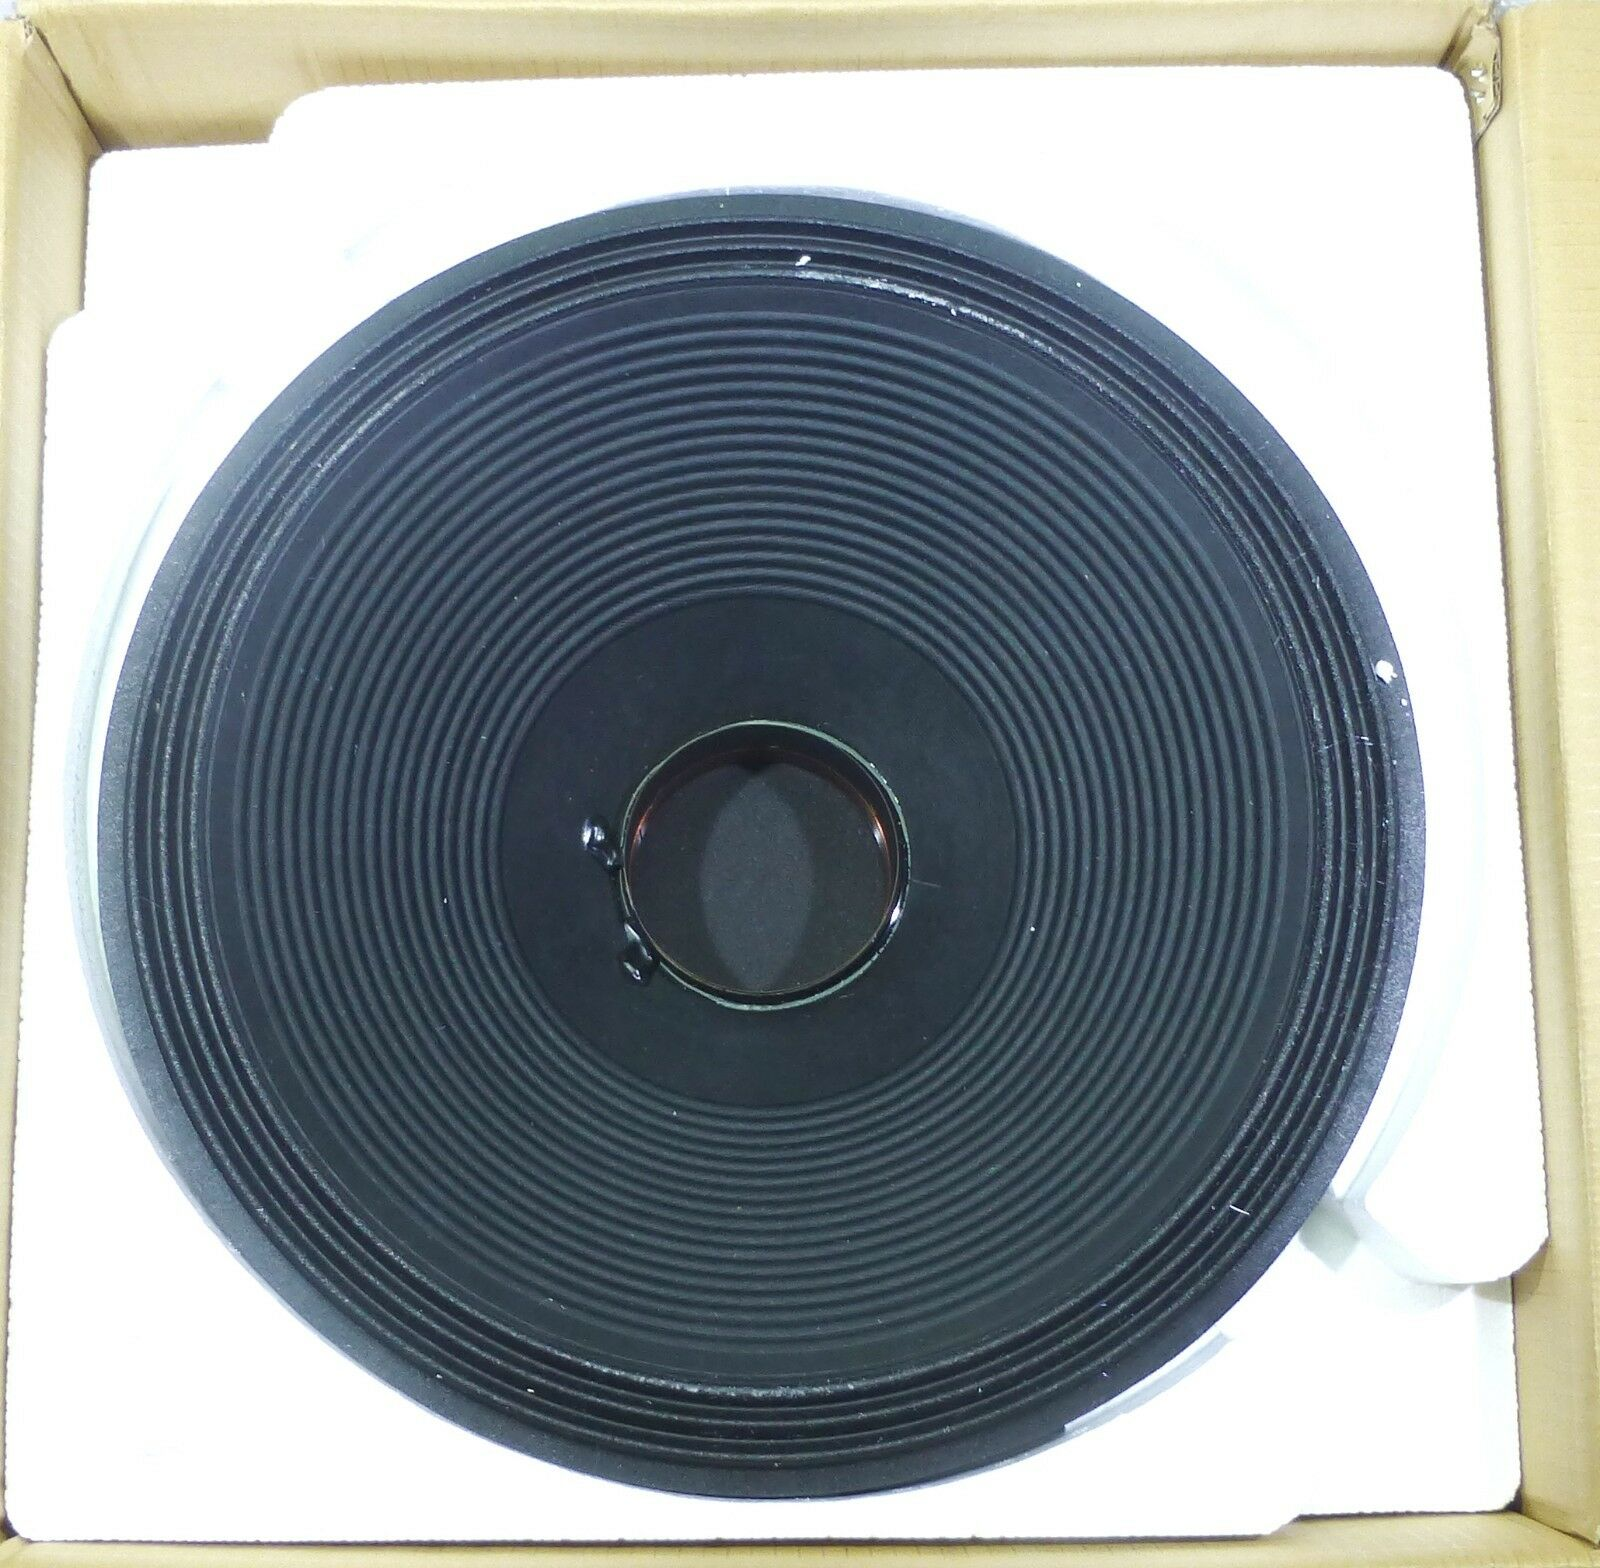 RK Lase 18LW-2000 18  altavoces altavoces altavoces de bobina de voz de 4  @ 8 ohmios RECONE KIT. 1cd1e8